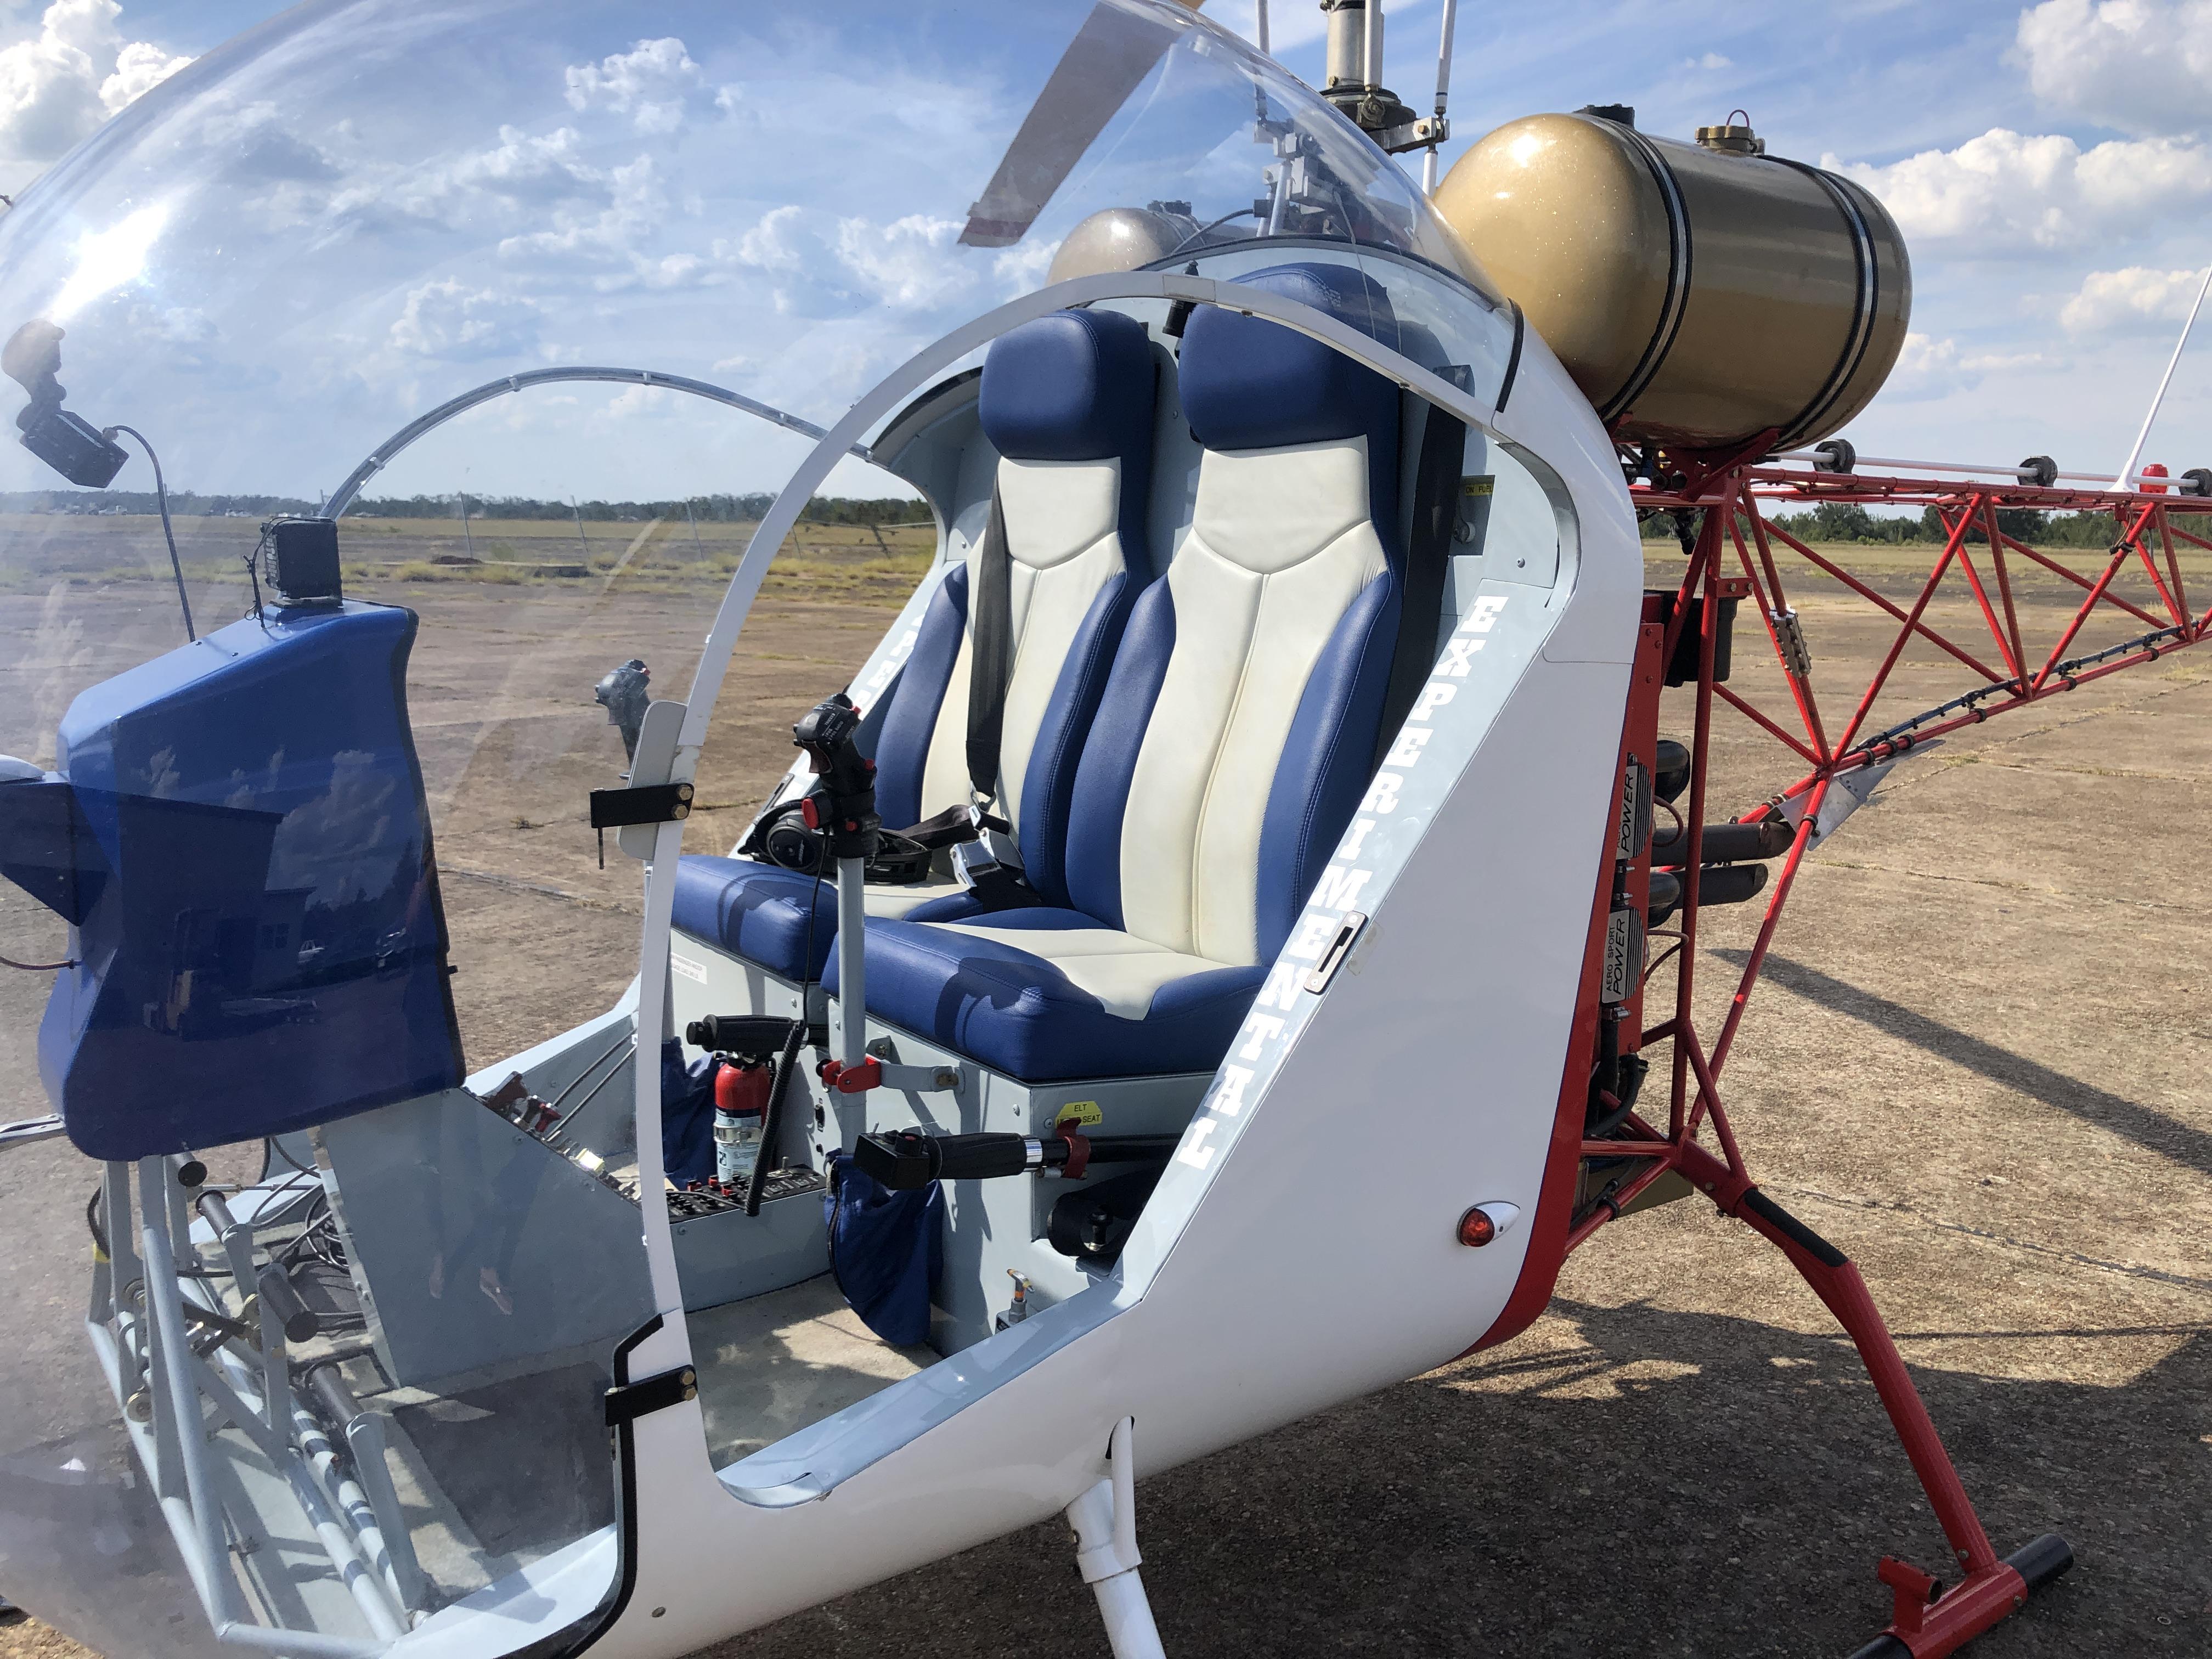 Aircraft Listing - Safari Pre 2011 listed for sale